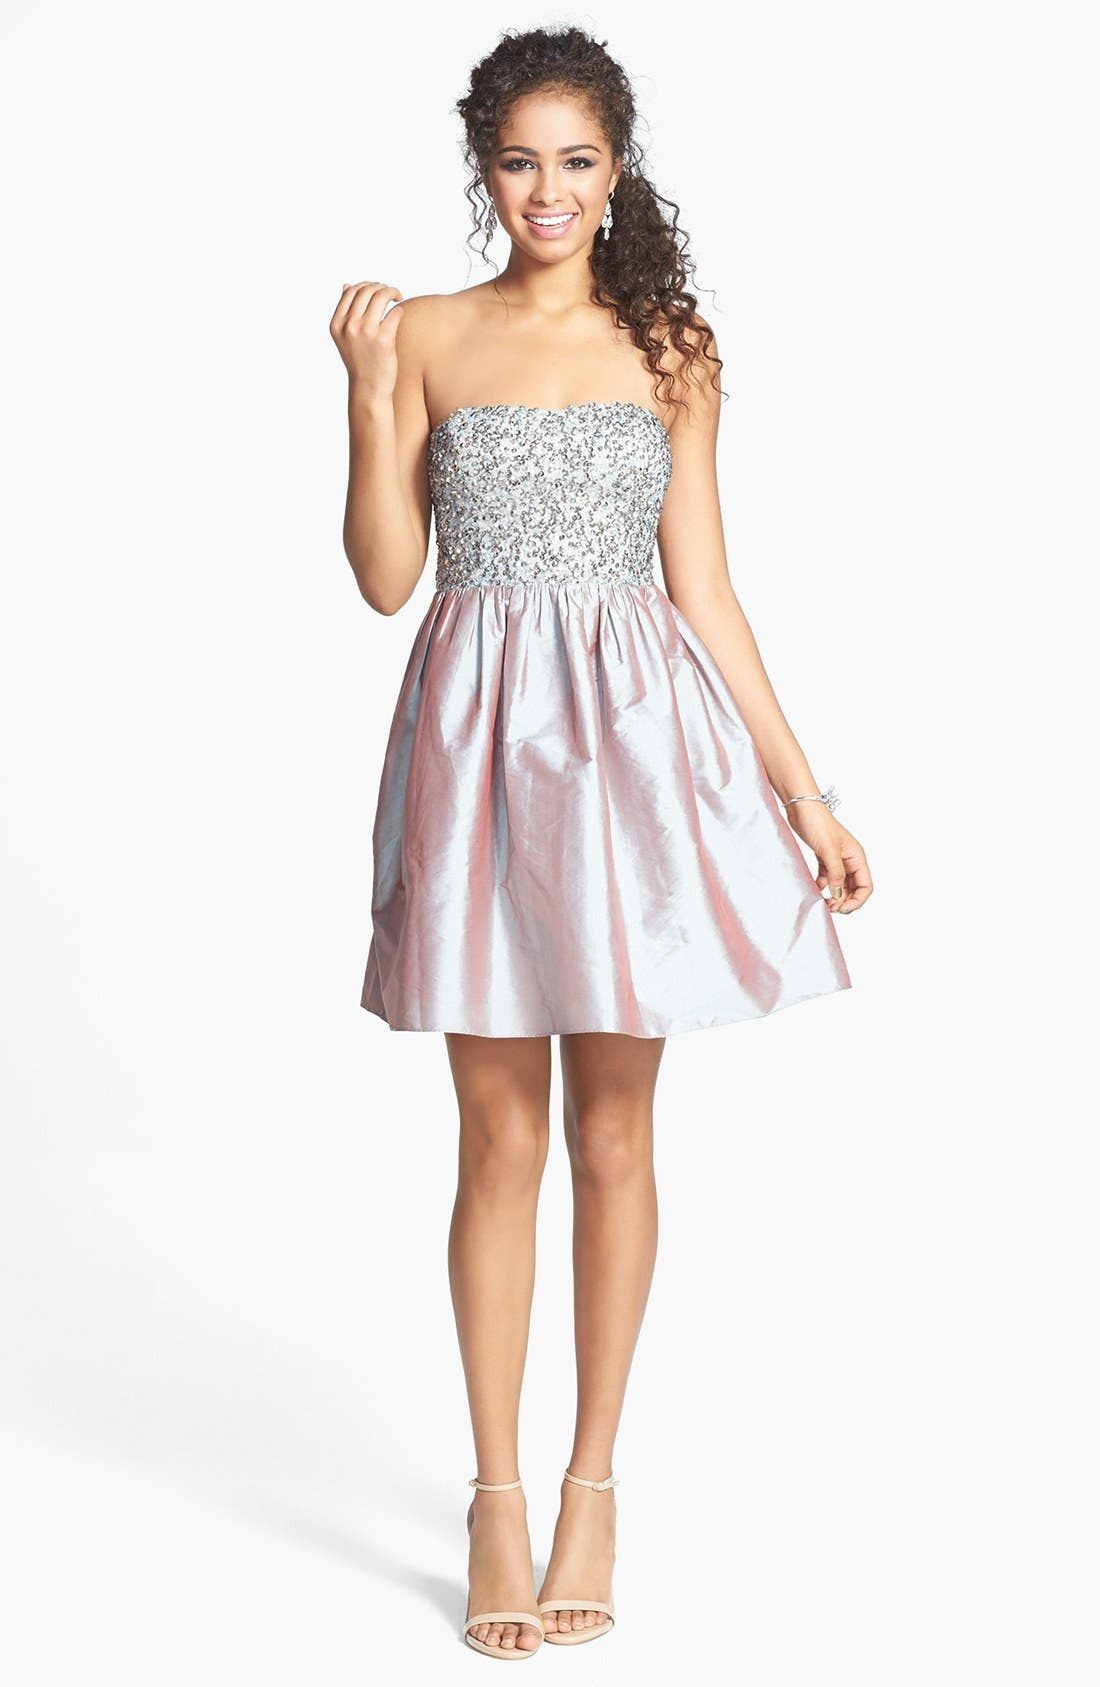 Main Image - Adrianna Papell Embellished Bodice Strapless Taffeta Dress